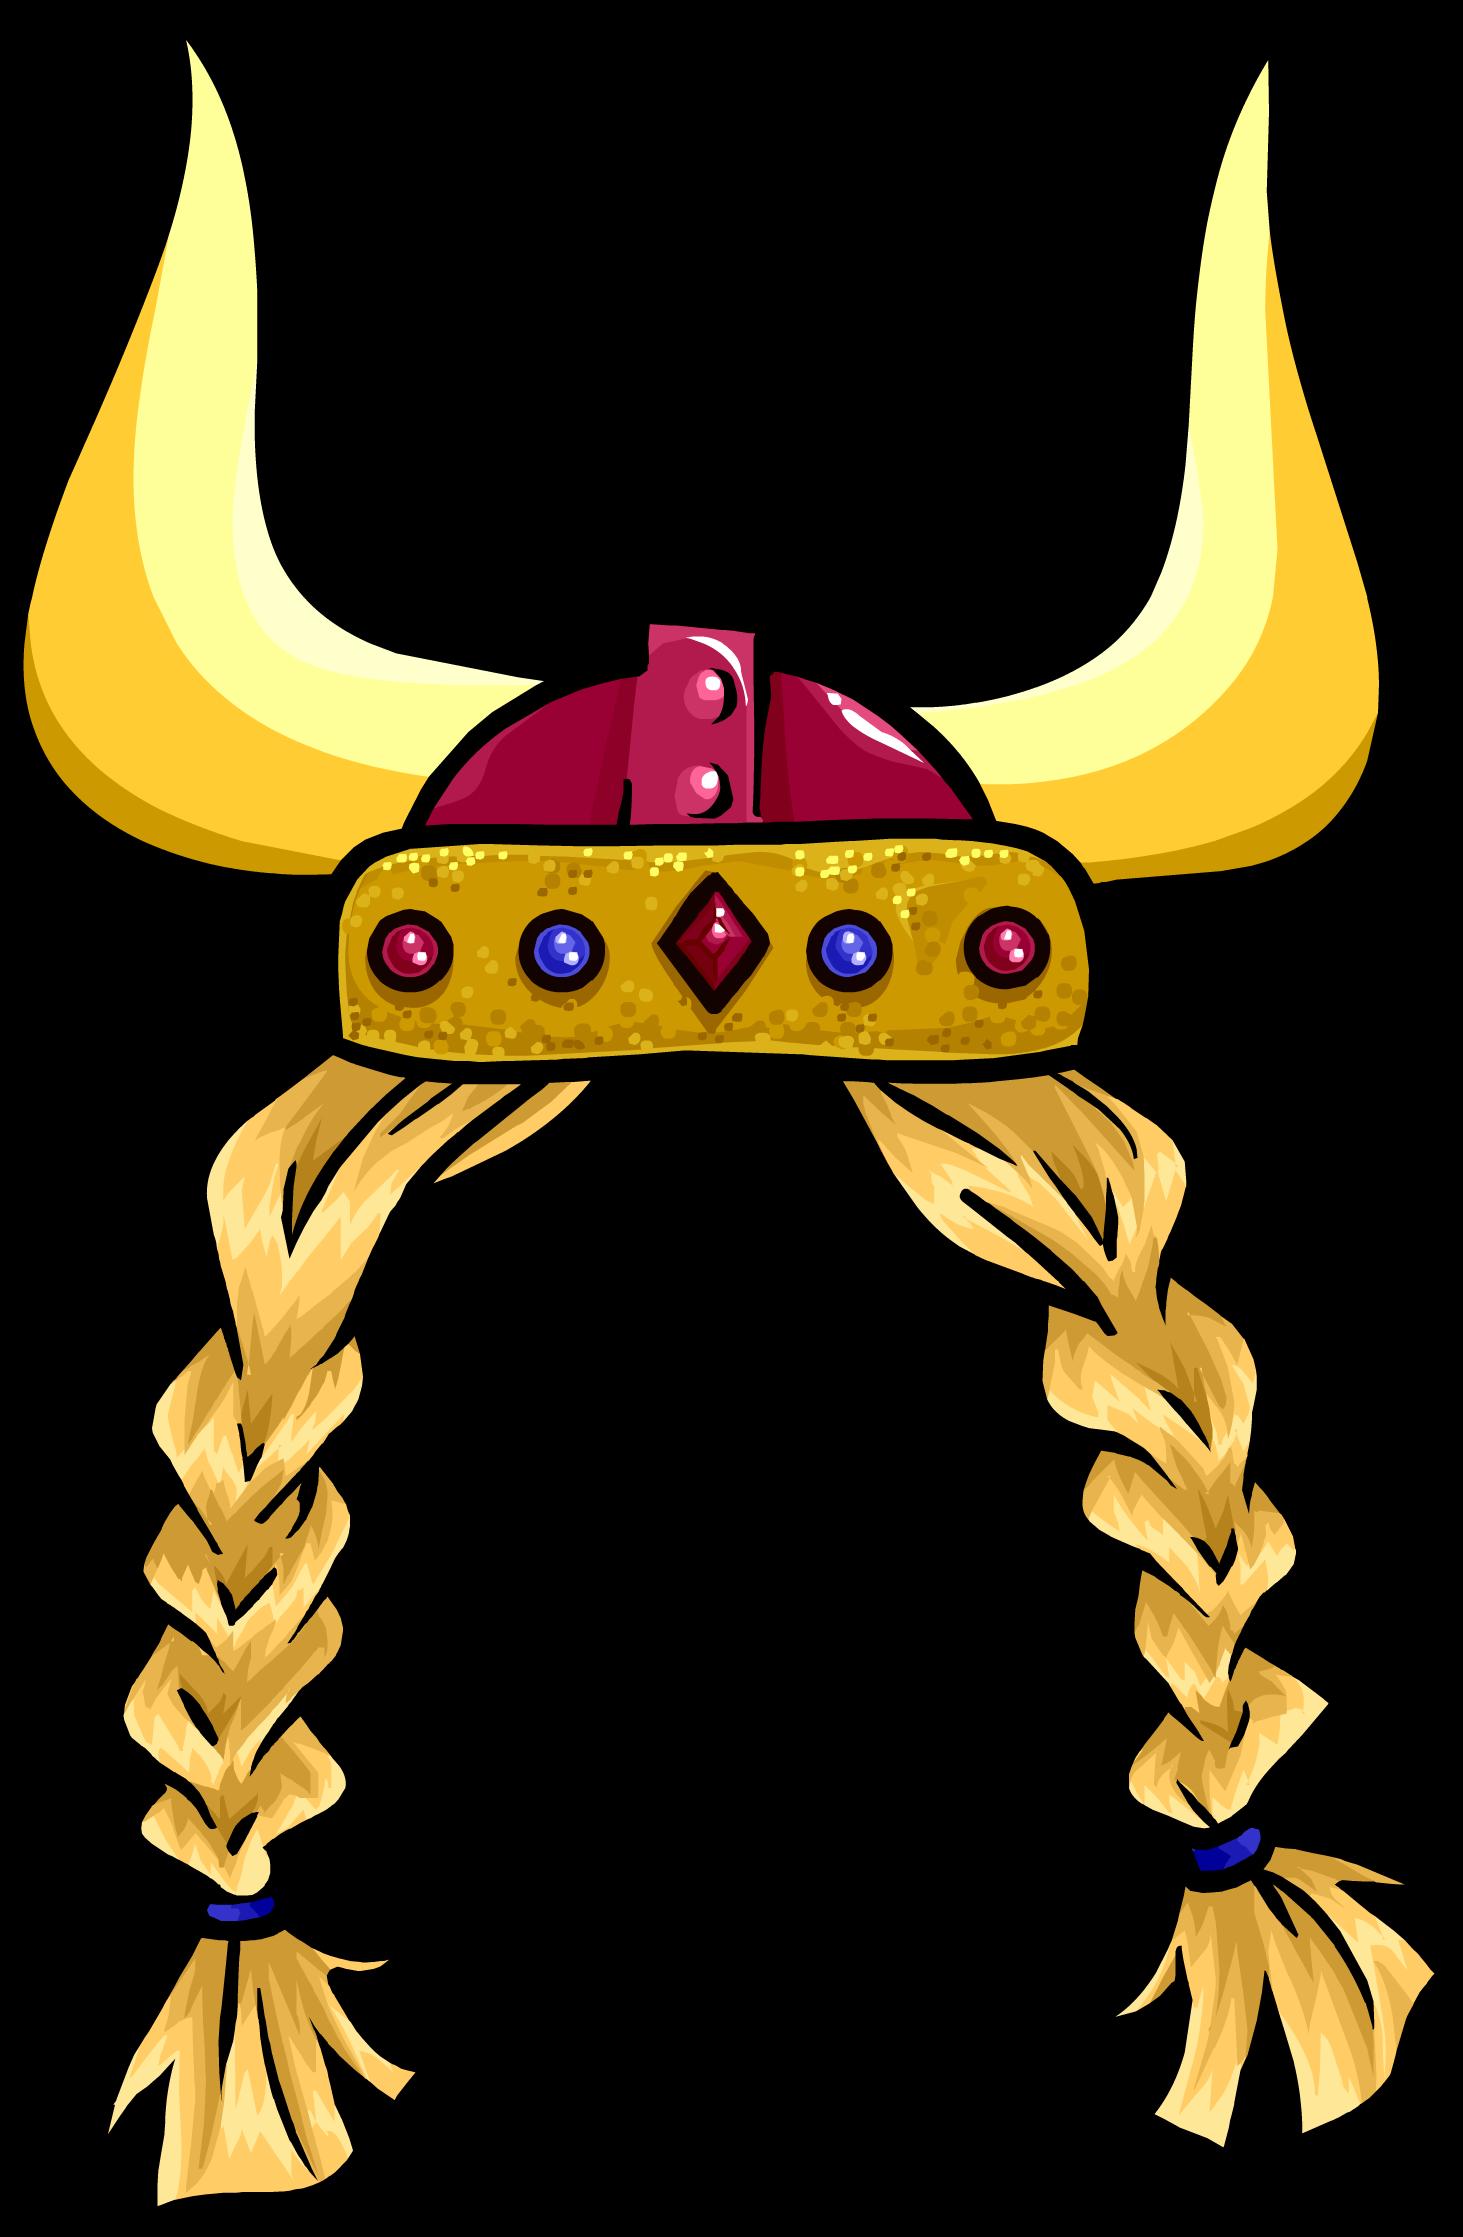 Image Jewelled Viking Helmet Png Club Penguin Wiki